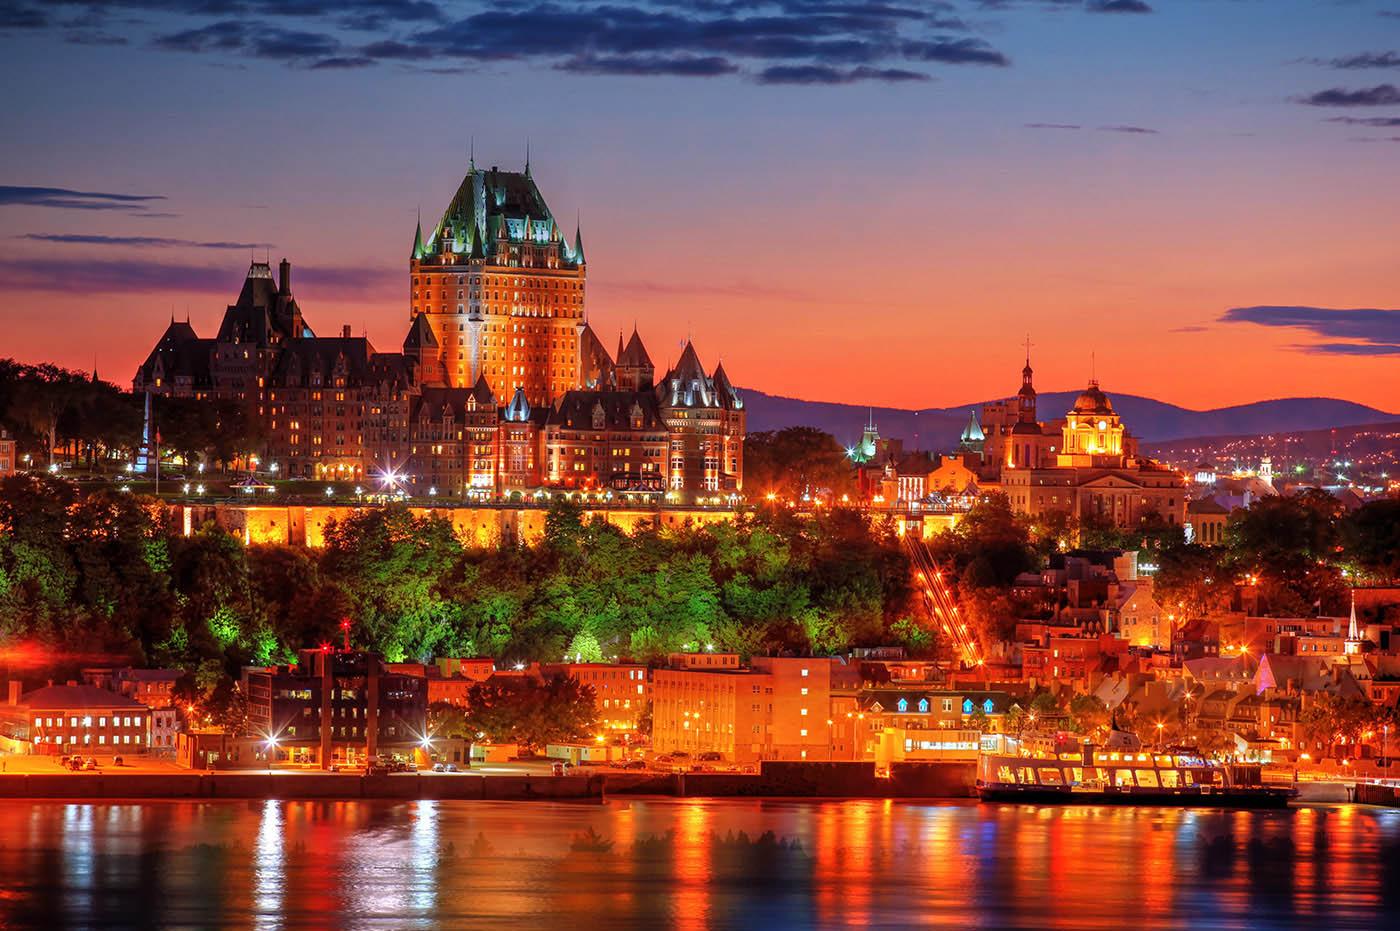 Quebec Frontenac Castle Montage 02 - Stock Photography